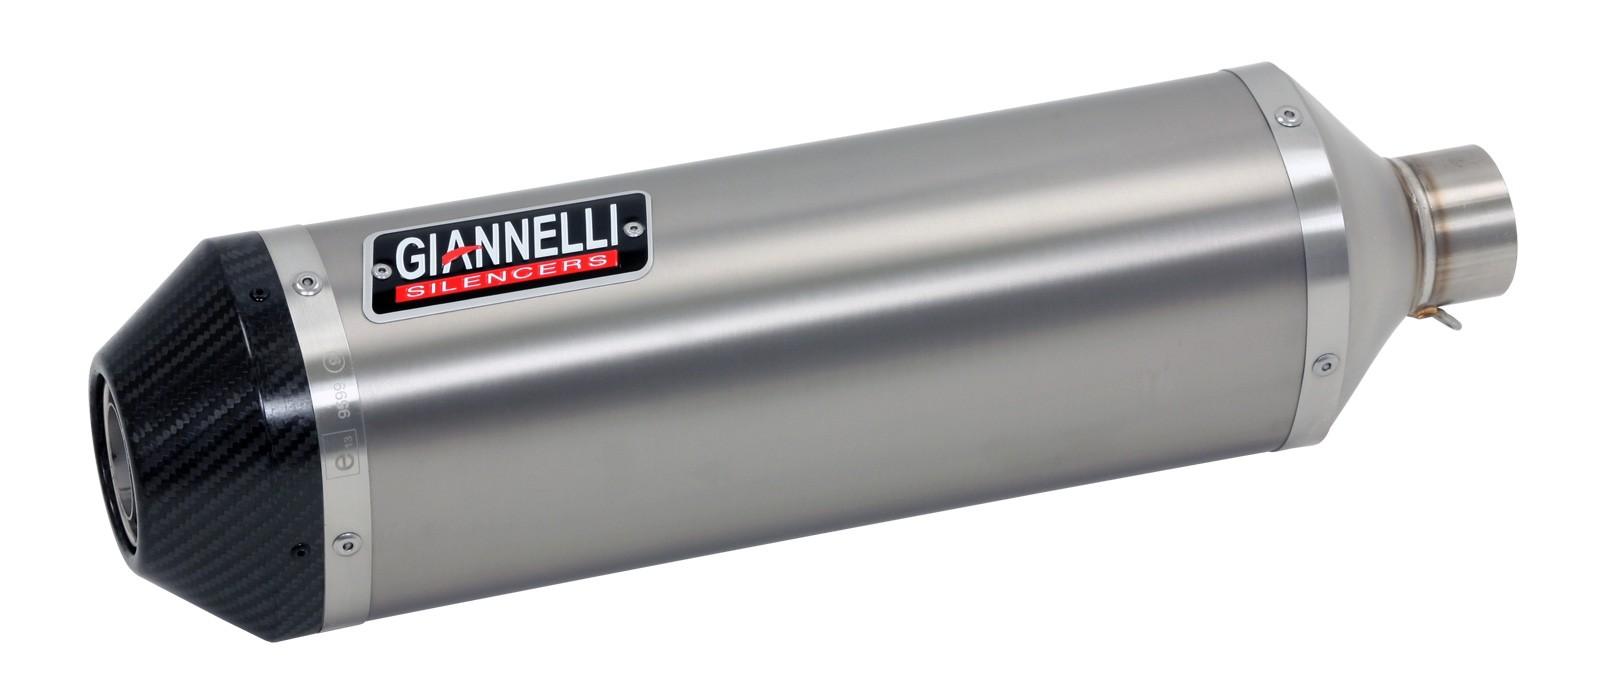 ESCAPES GIANNELLI YAMAHA - Sistema completo IPERSPORT Silenciador aluminio versión Black Line Yamaha MT-125 Giannelli 7